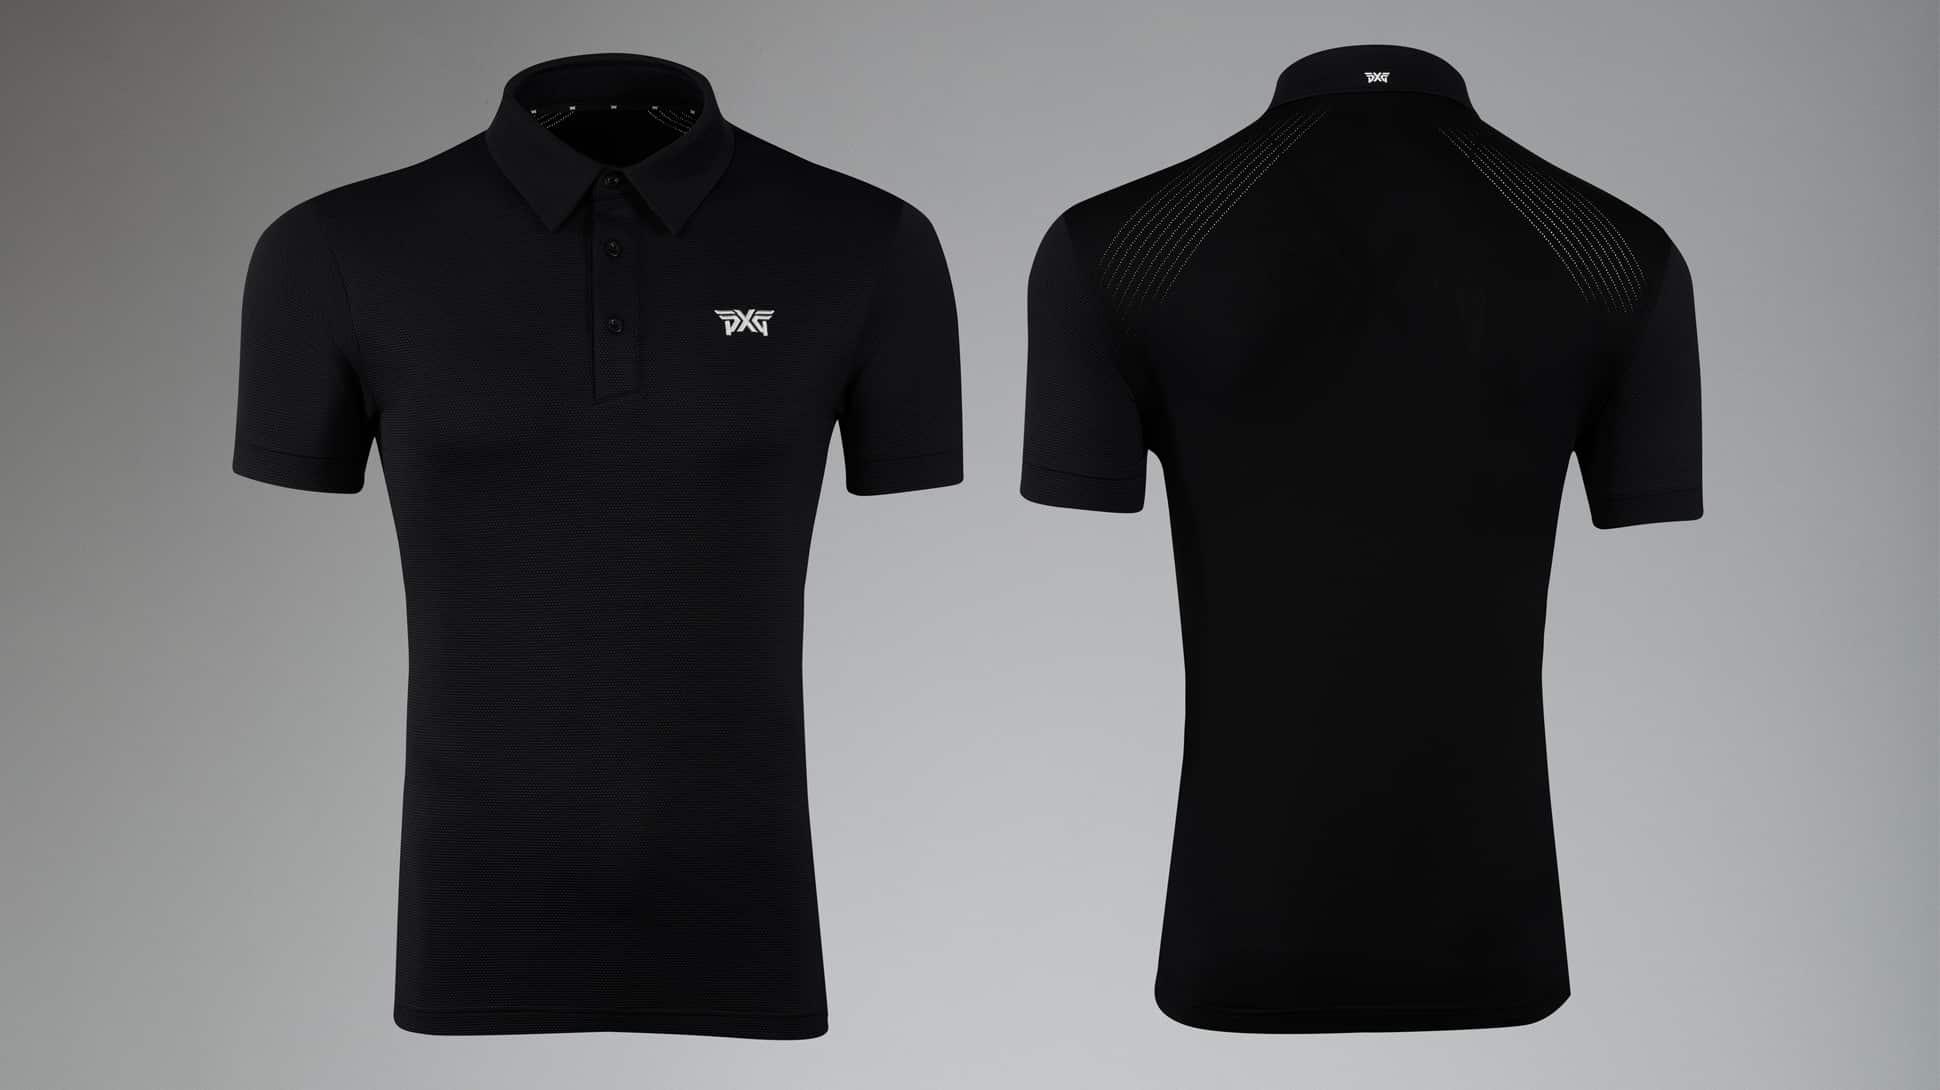 Essential Polo Image 2